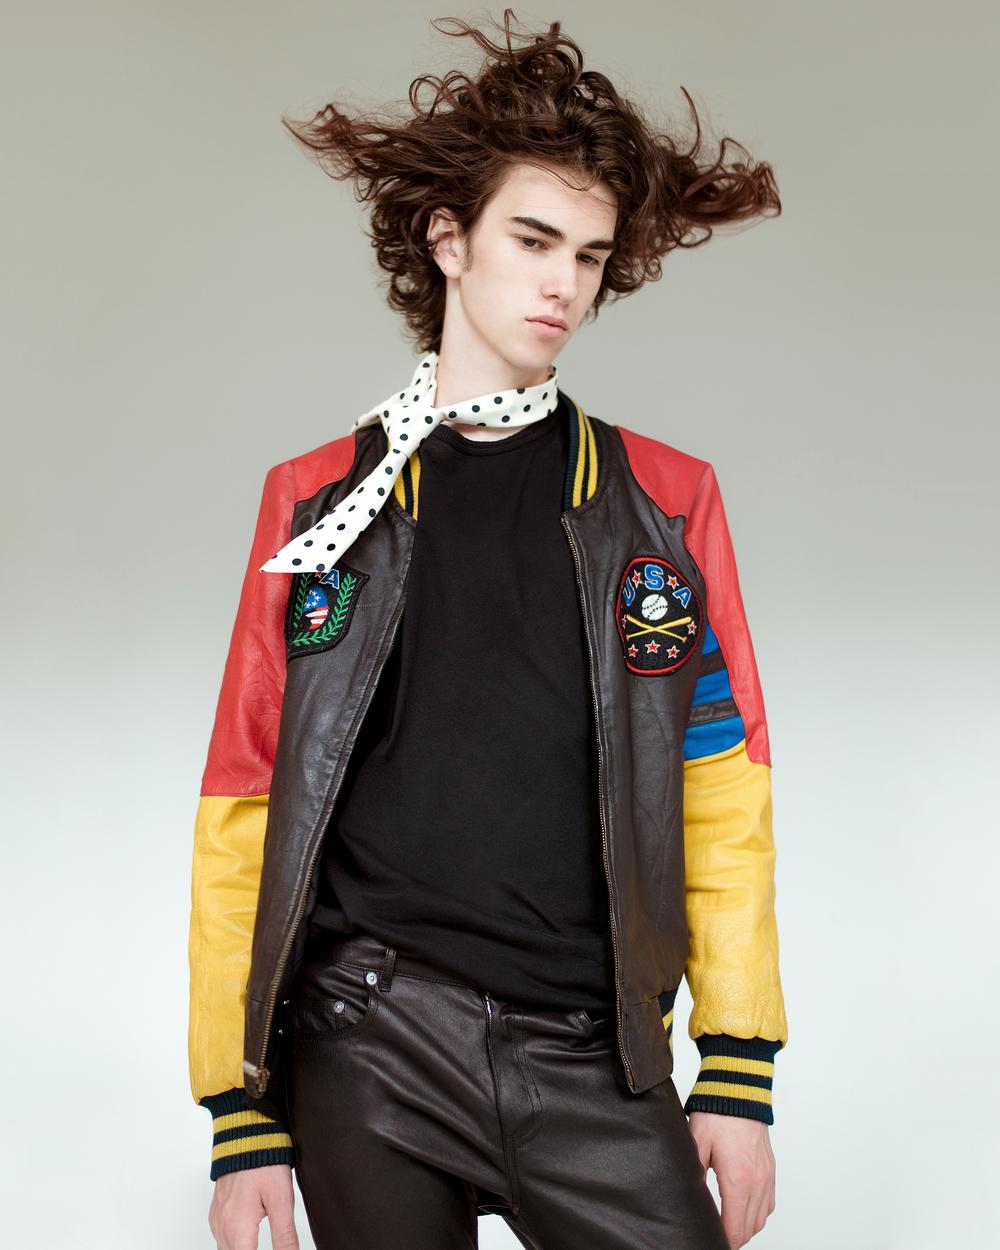 Vintage necktie   Vintage Letterman Jacket   Damir Doma tee   Saint Laurent pants